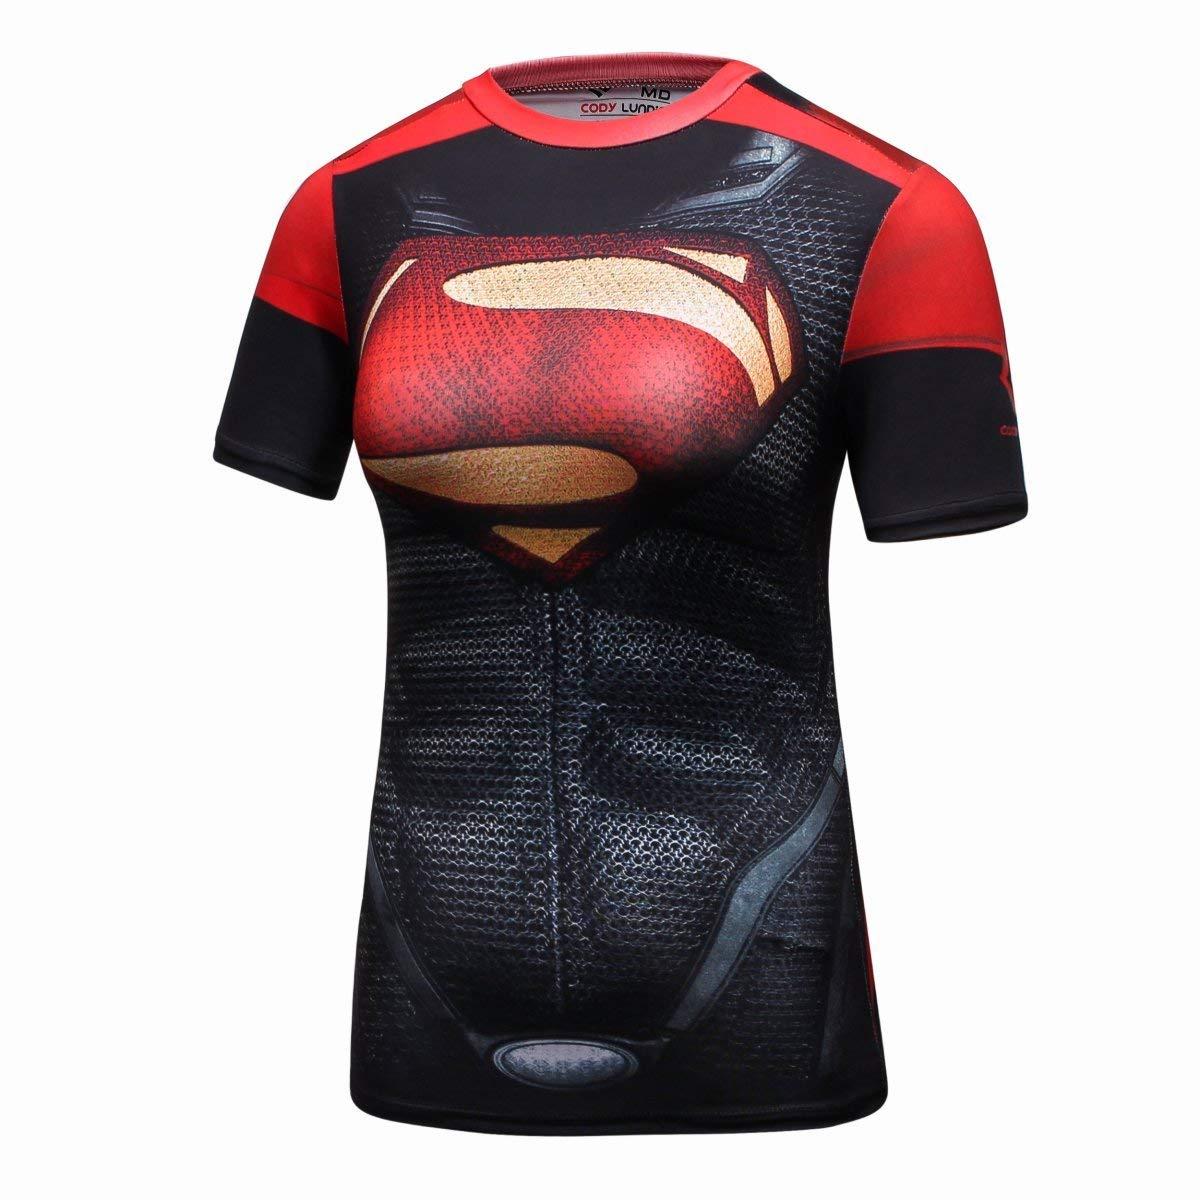 Superman compression shirt for women